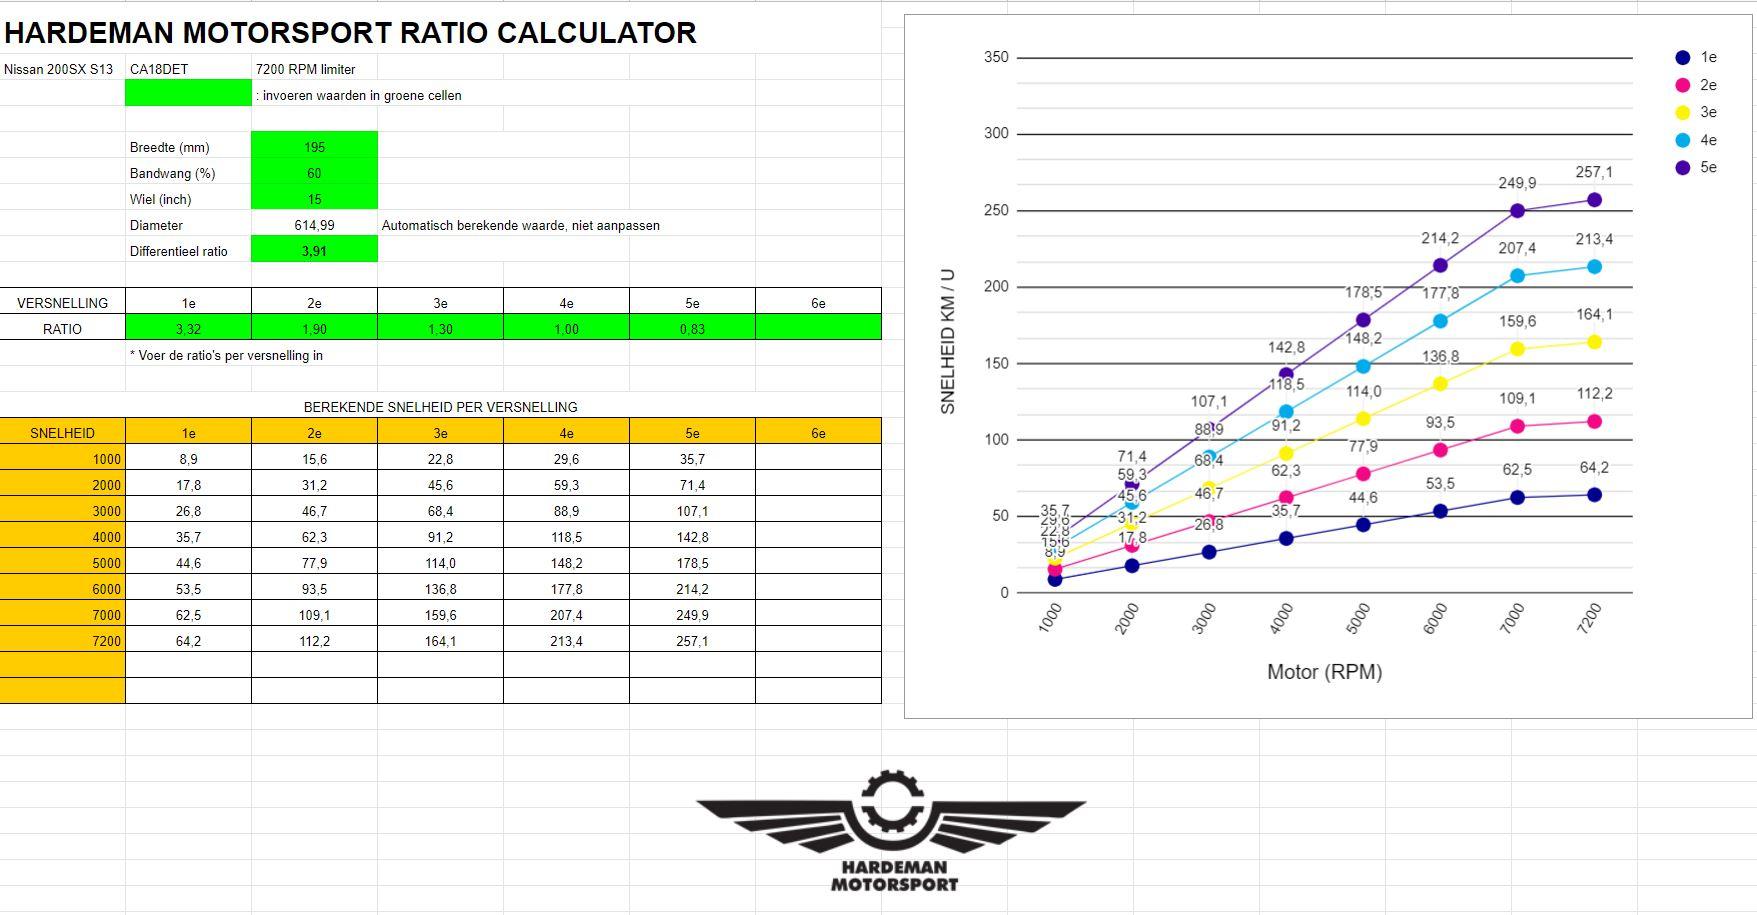 differentieel tandwielen Nissan R200 diff 3.69 (Niet 350Z en ouder)